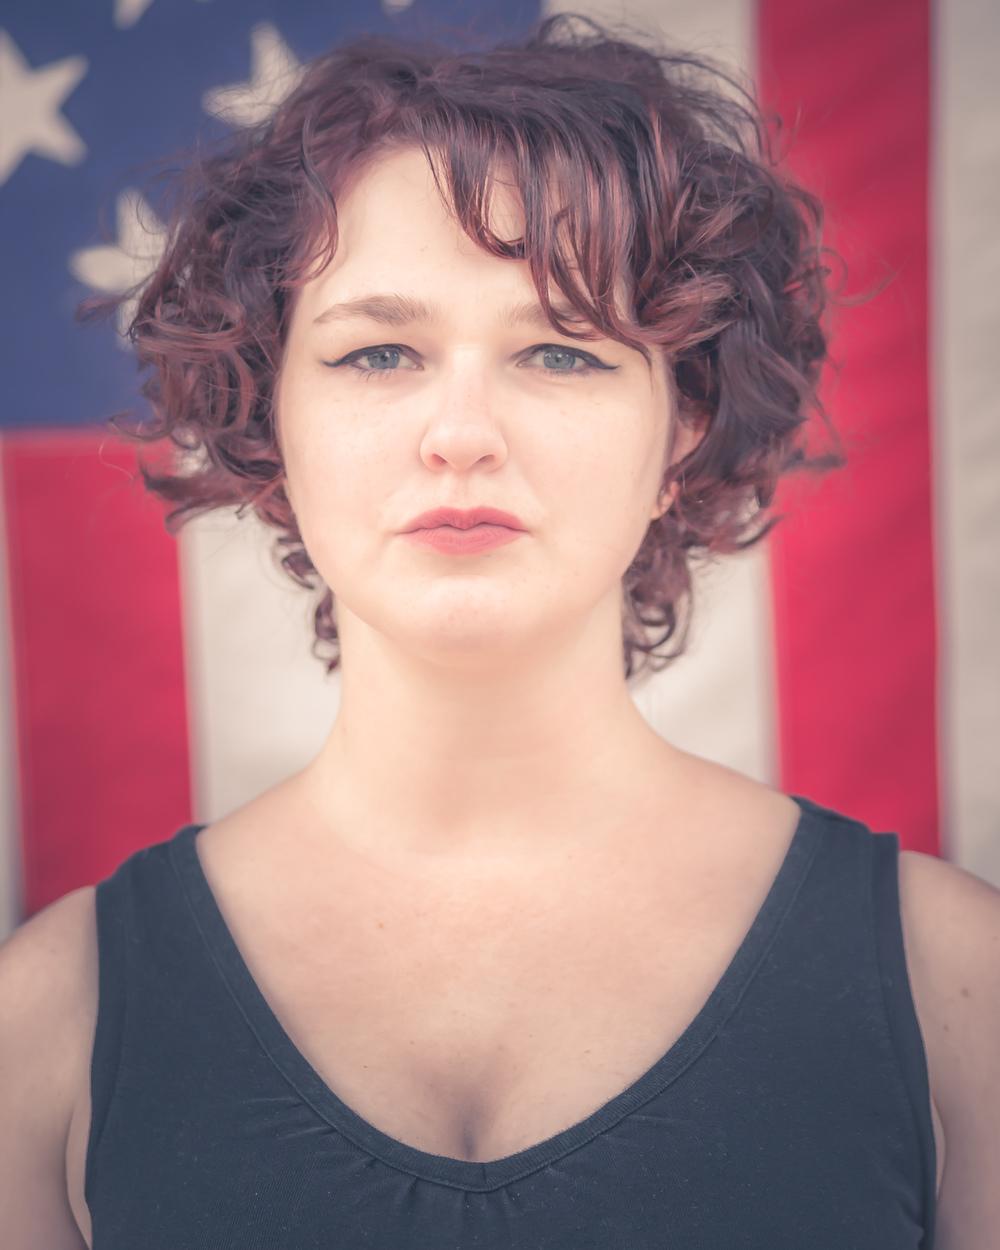 Alyssa Day as Marcy